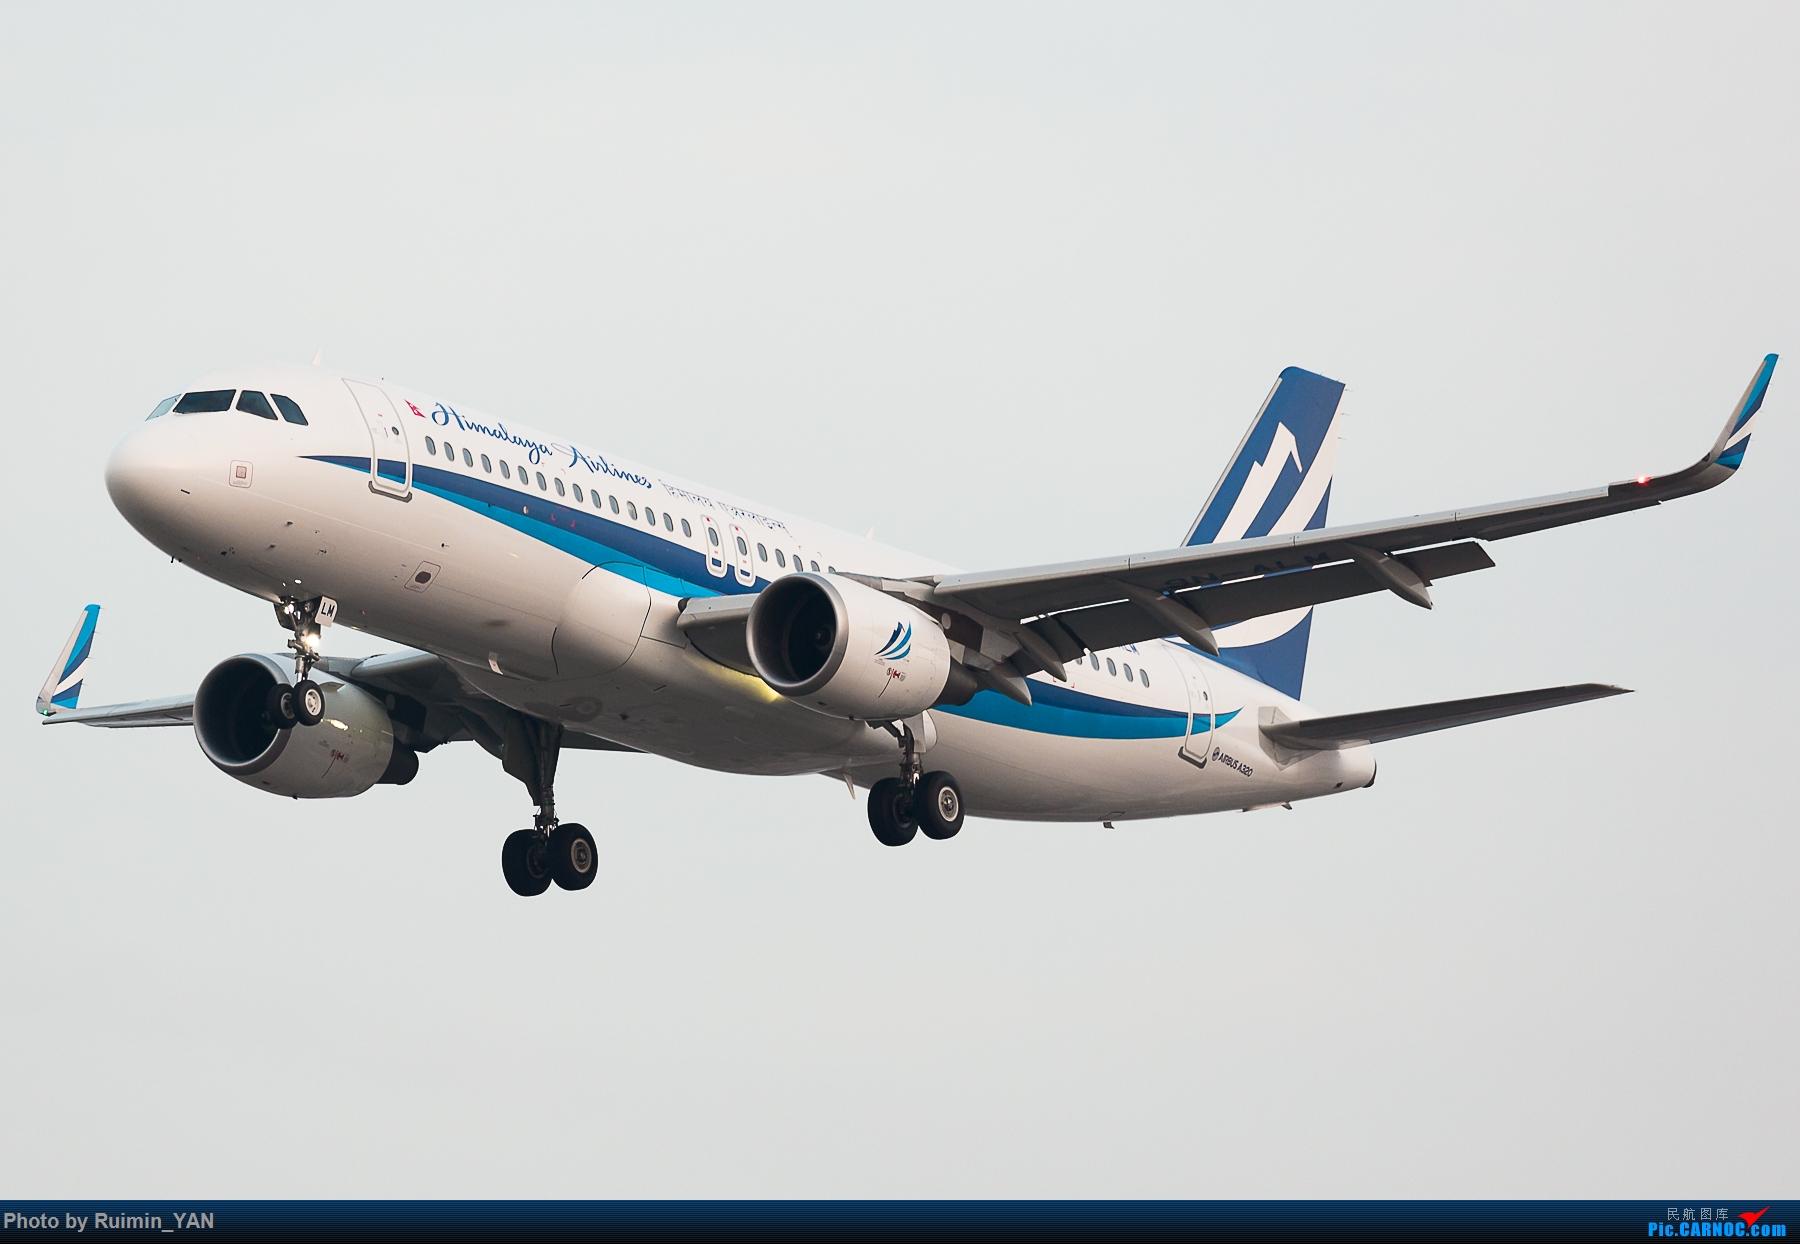 Re:[原创]【PEK飞友会】尼泊尔总理奥利今起对中国进行正式访问,并出席博鳌亚洲论坛年会,乘坐喜马拉雅航空(Himalaya Airlines,H91,HIM001) AIRBUS A320-200 9N-ALM 中国北京首都国际机场